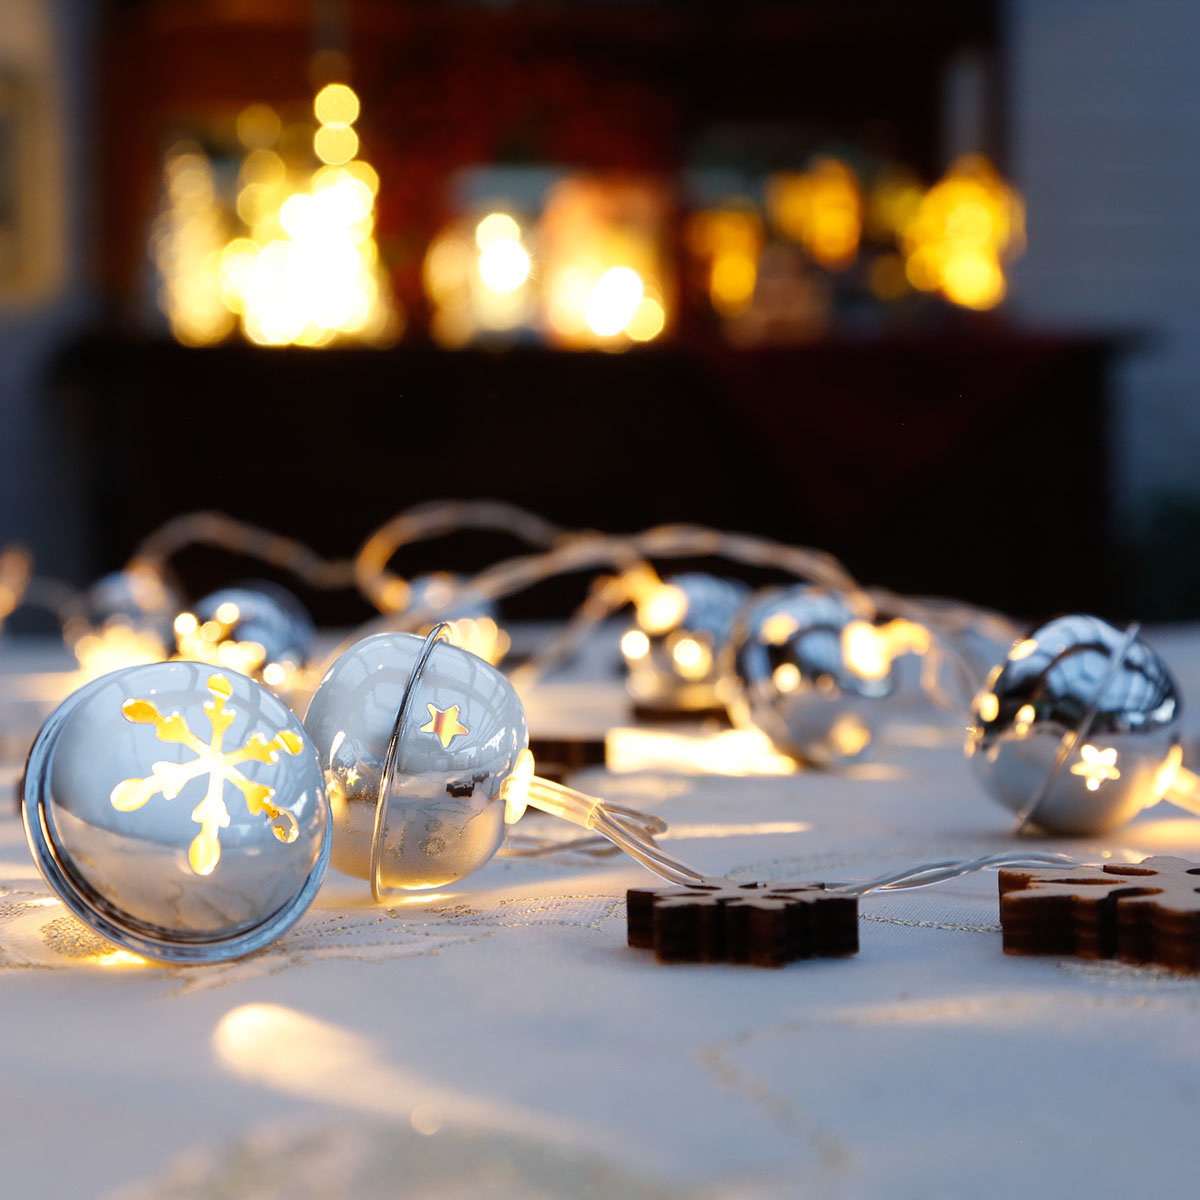 LED-Lichterkette Silberglöckchen | #2